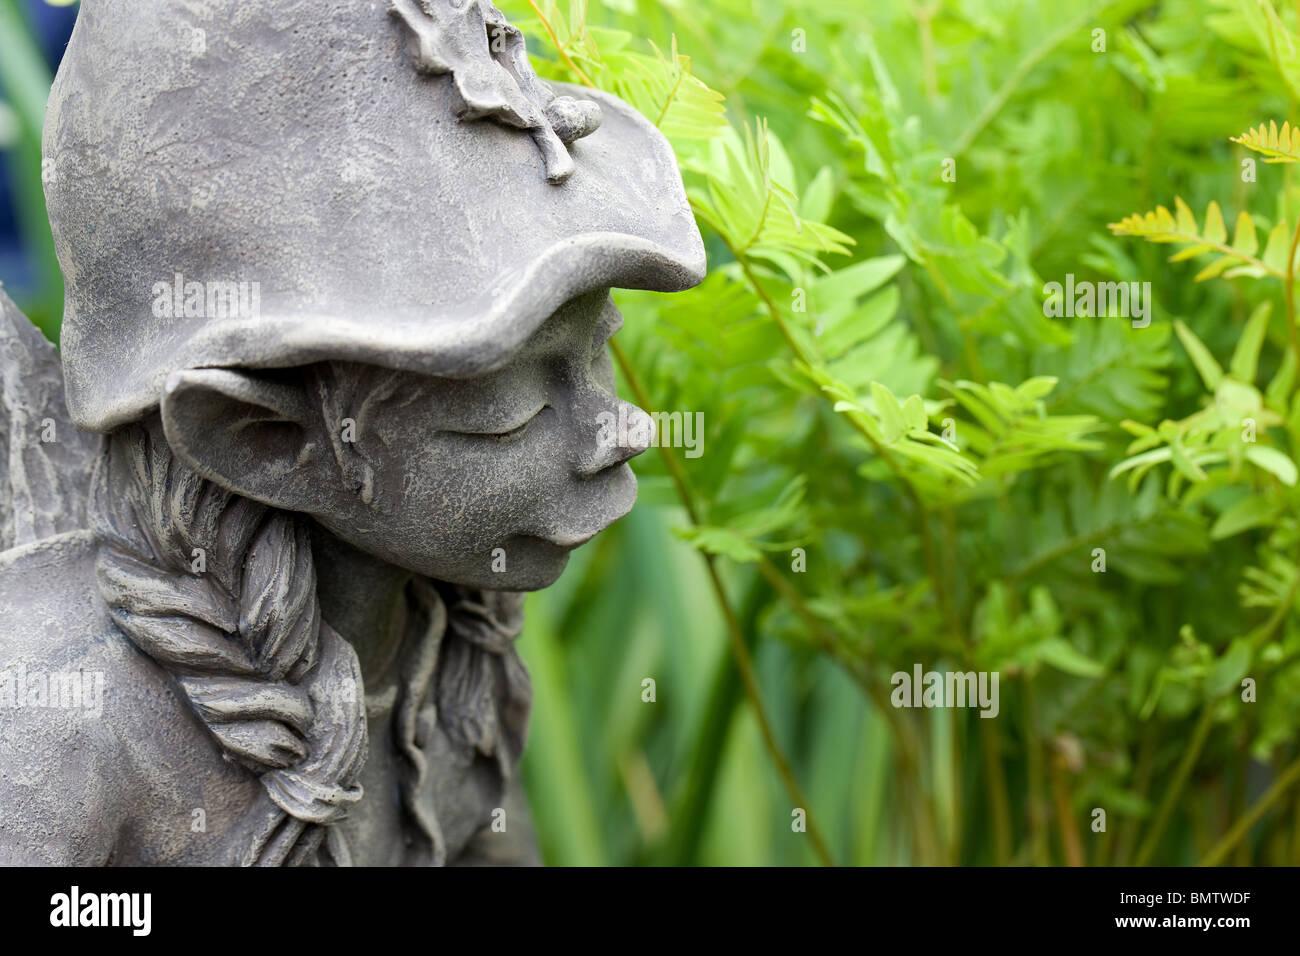 Gentil Elf Garden Statue, Fountain, Gifts, Handicrafts, Hobbies, Gardening,  Flowers,